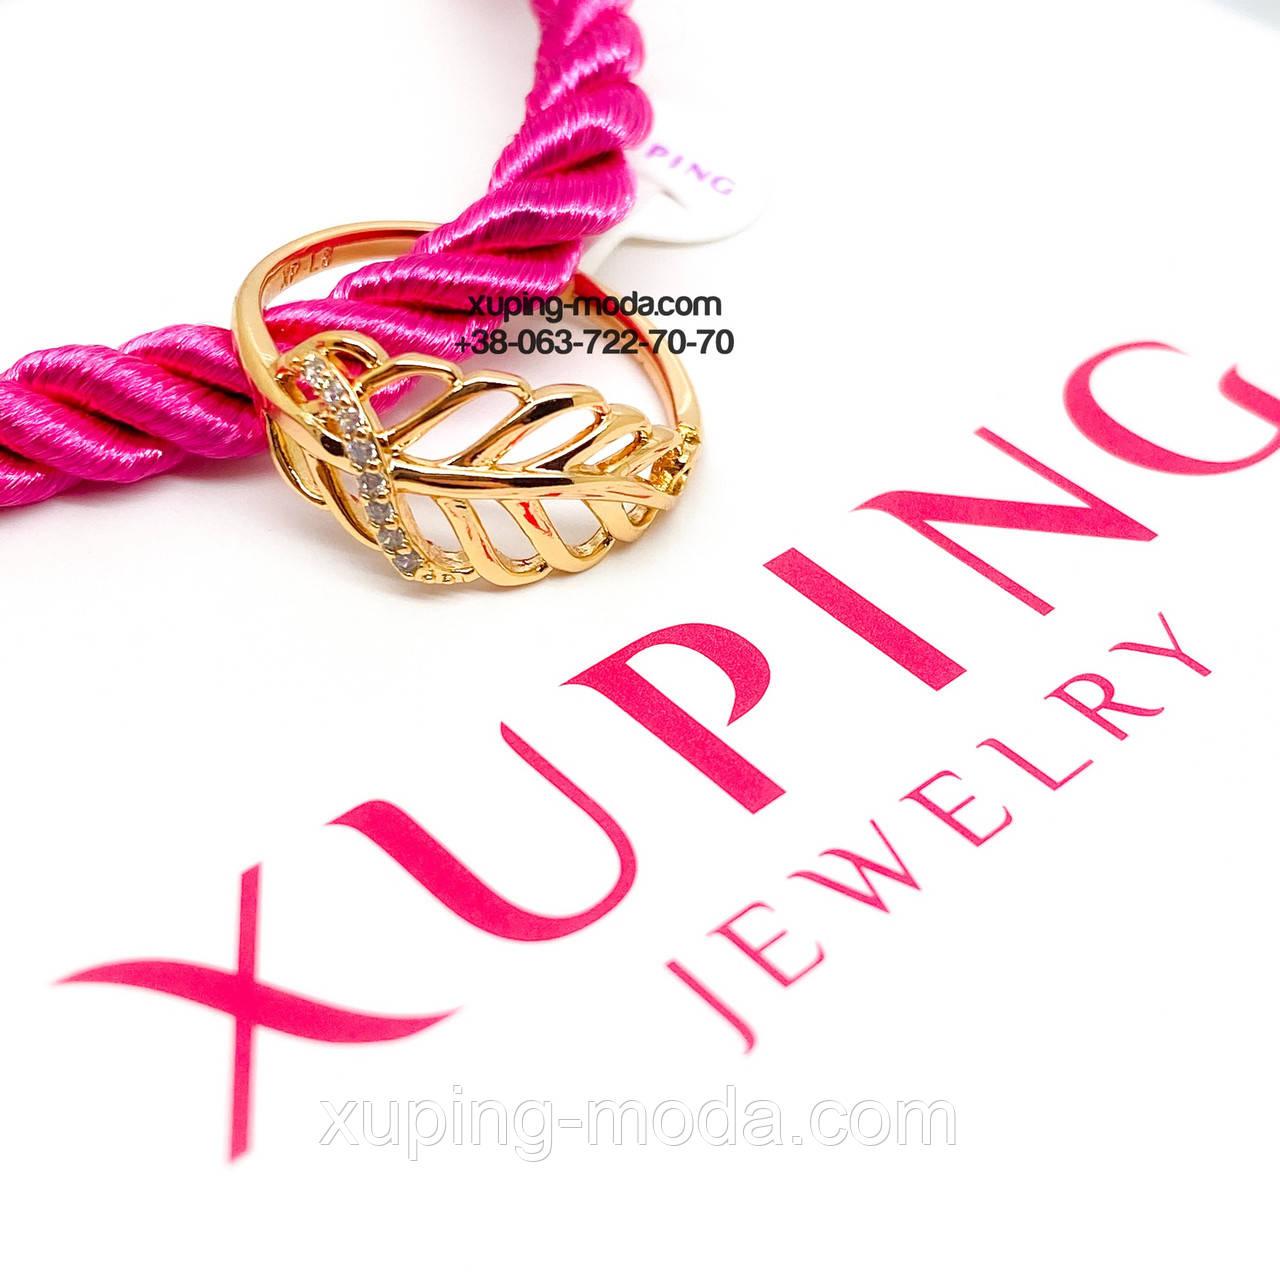 Кольцо листик 20 р. Бижутерия xuping